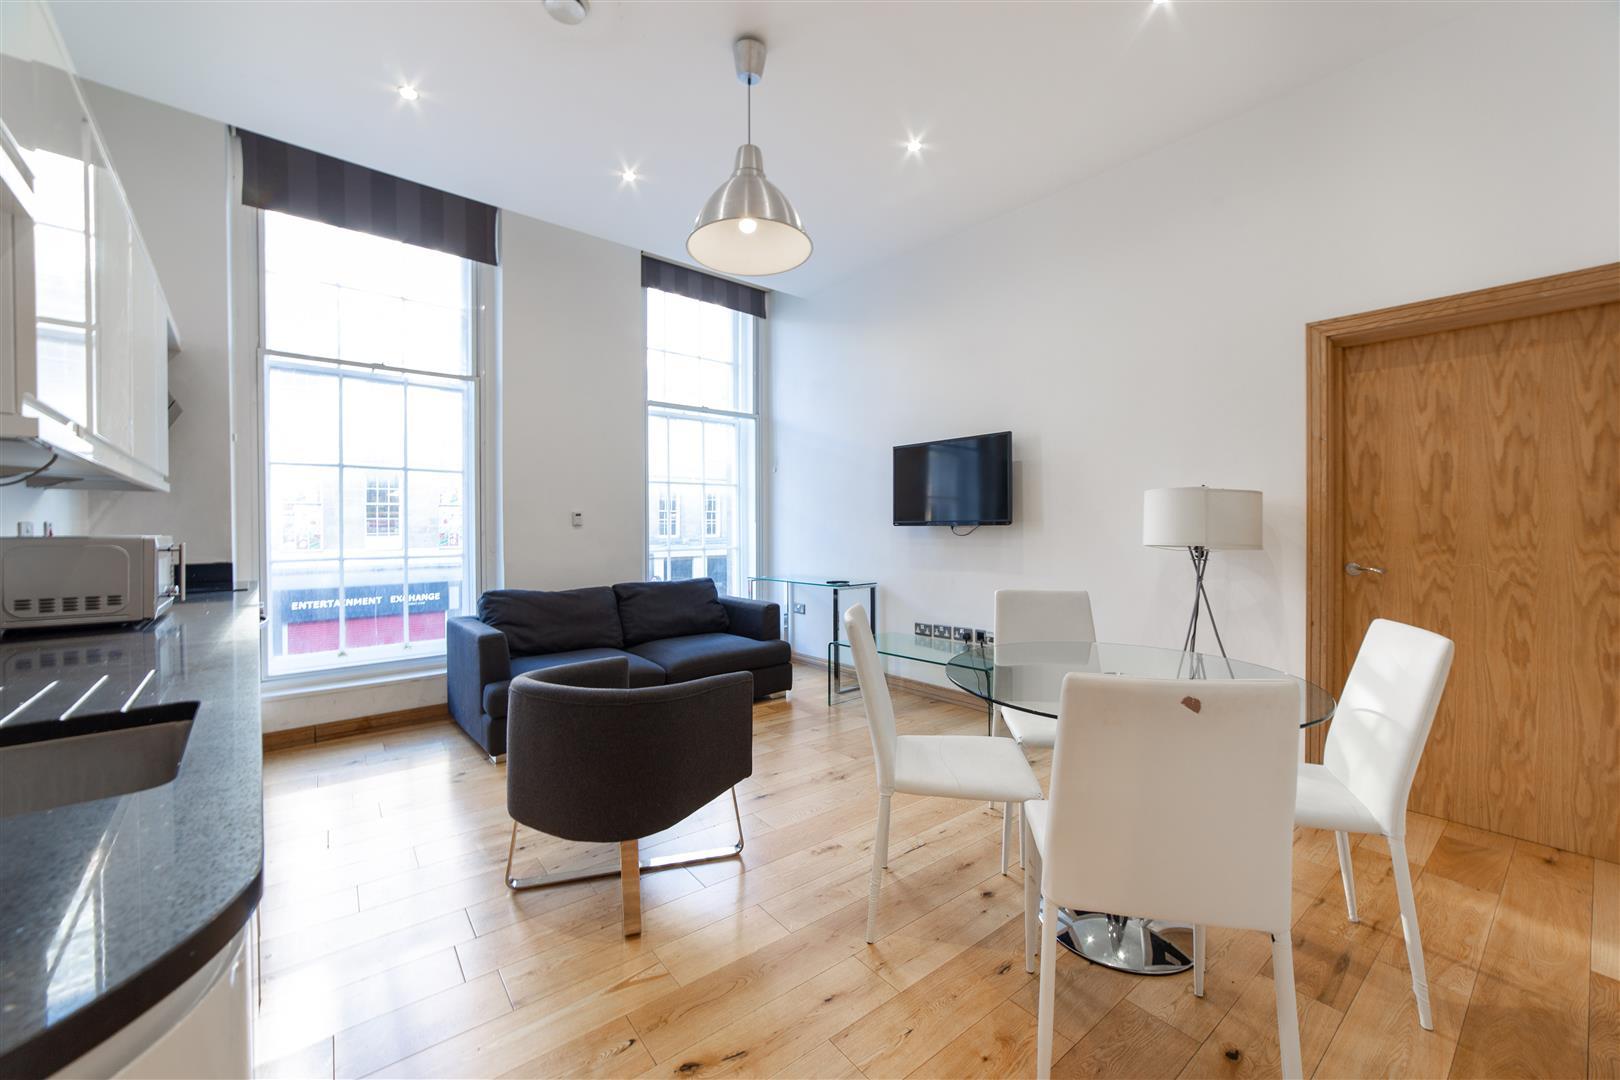 2 bed apartment to rent in Grainger Street, City Centre, NE1